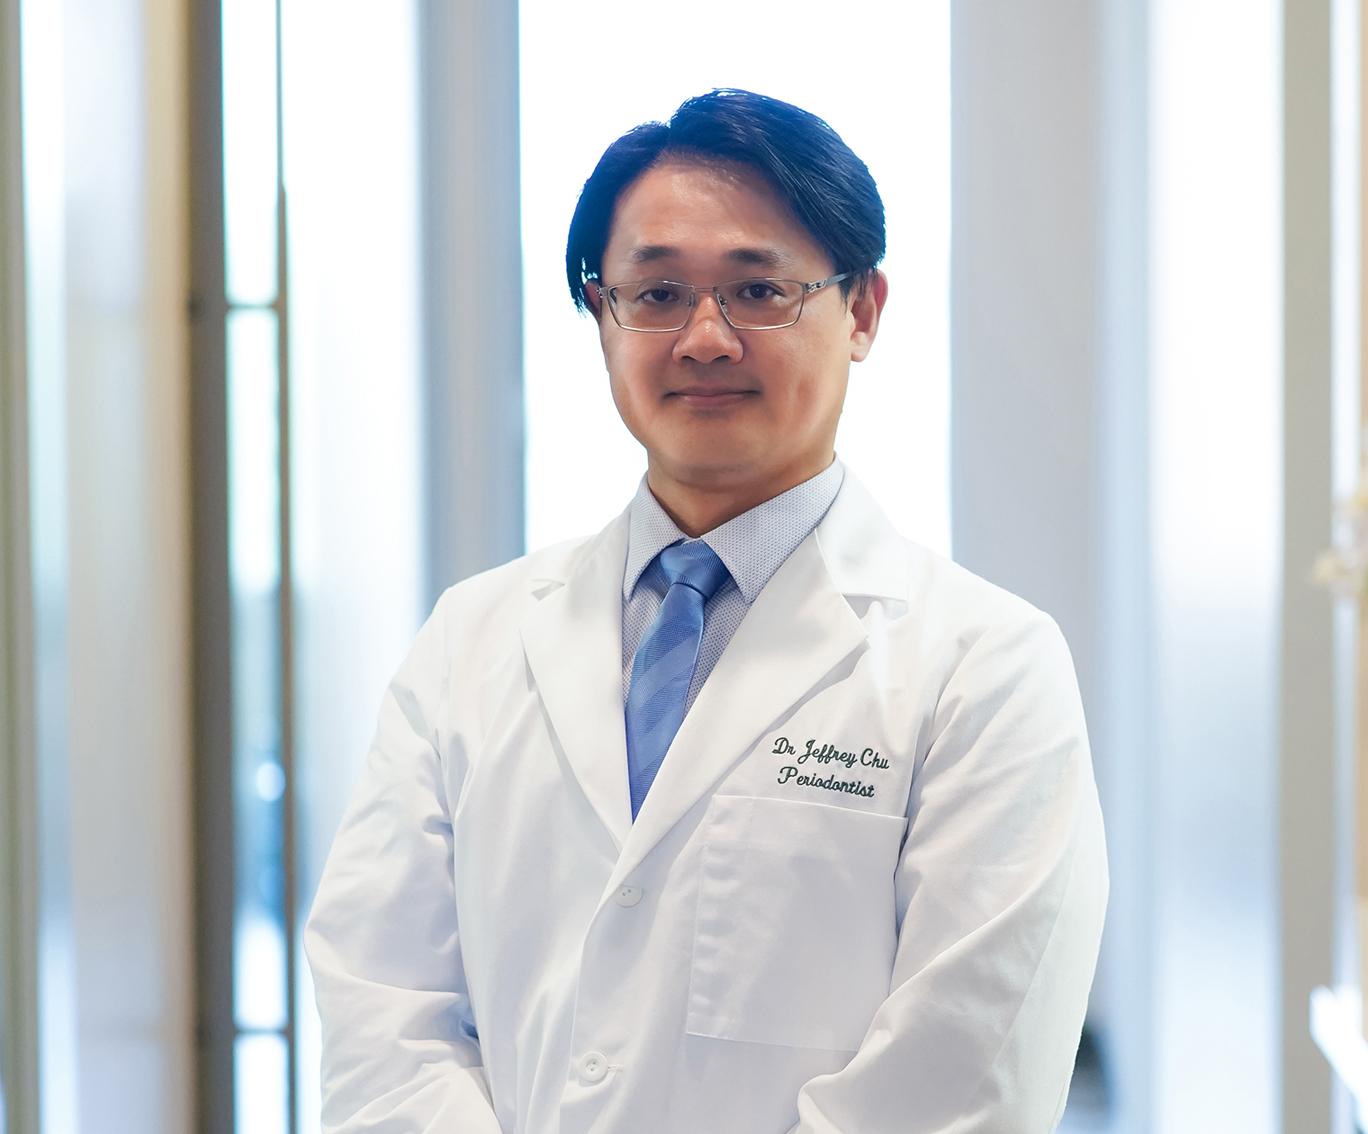 Dr Jeff Chu